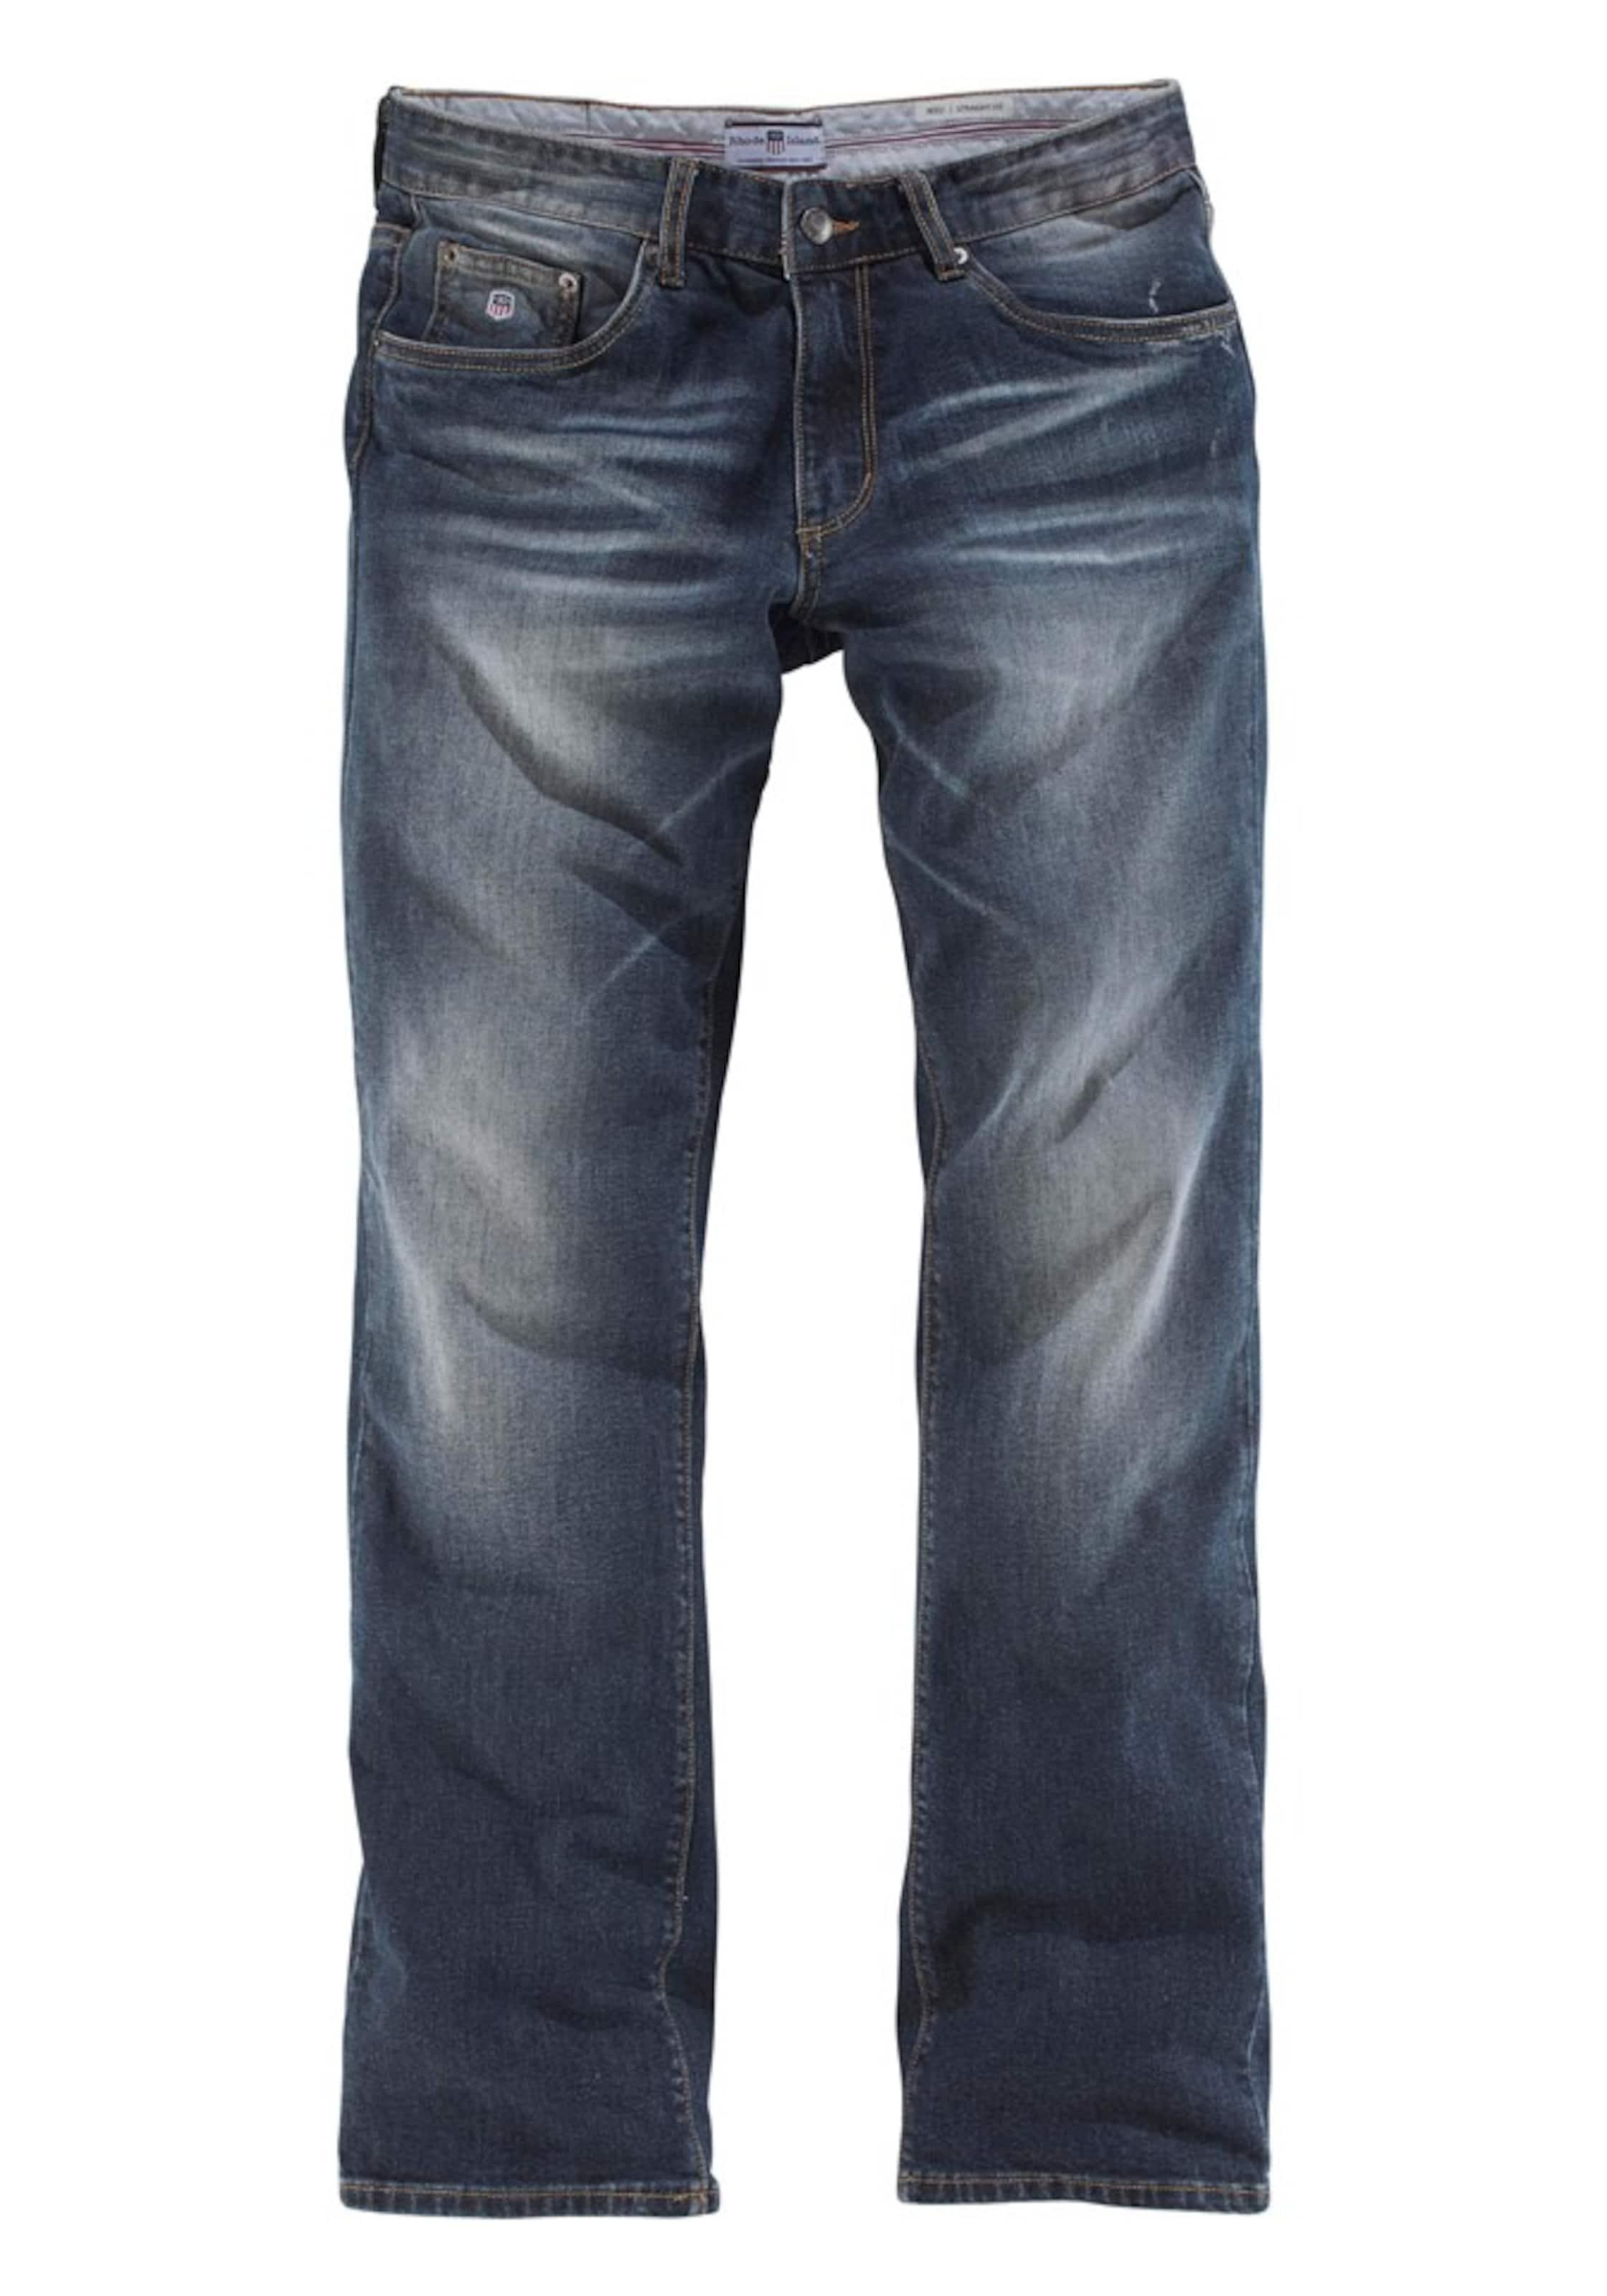 Rabatt 2018 RHODE ISLAND Stretch Jeans Rabatt Bestellen L2hswVtlU